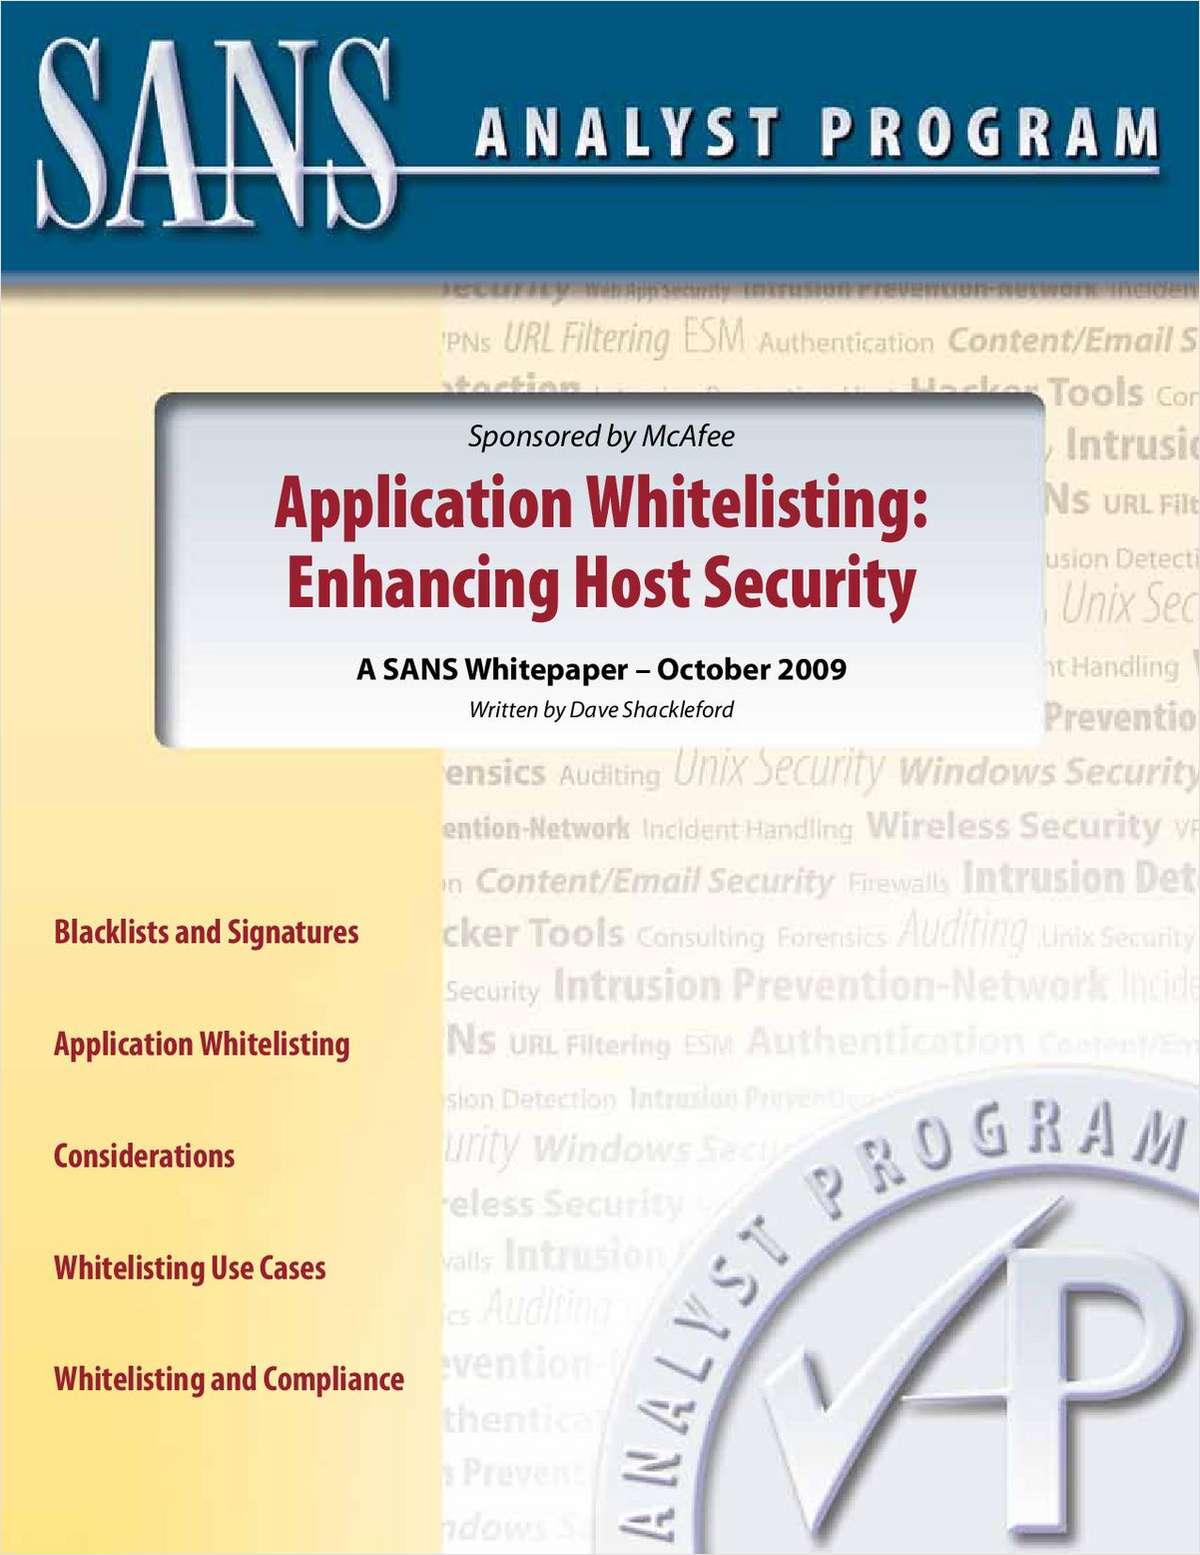 Understanding Application Whitelisting